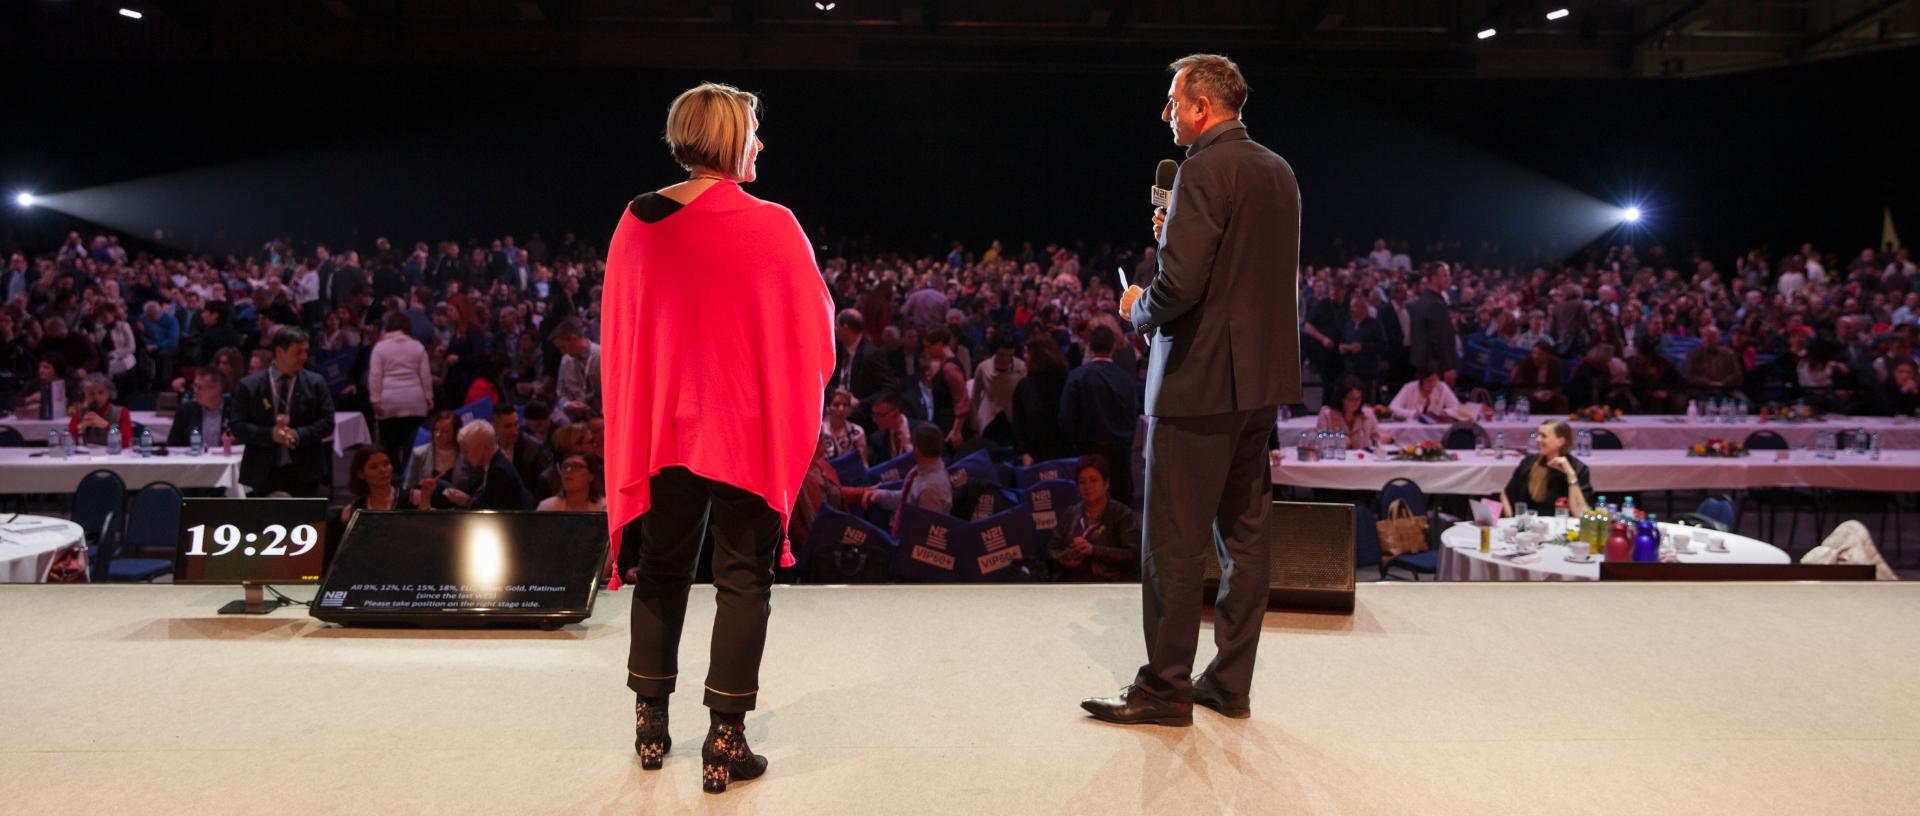 Monika & Bernd Rohr